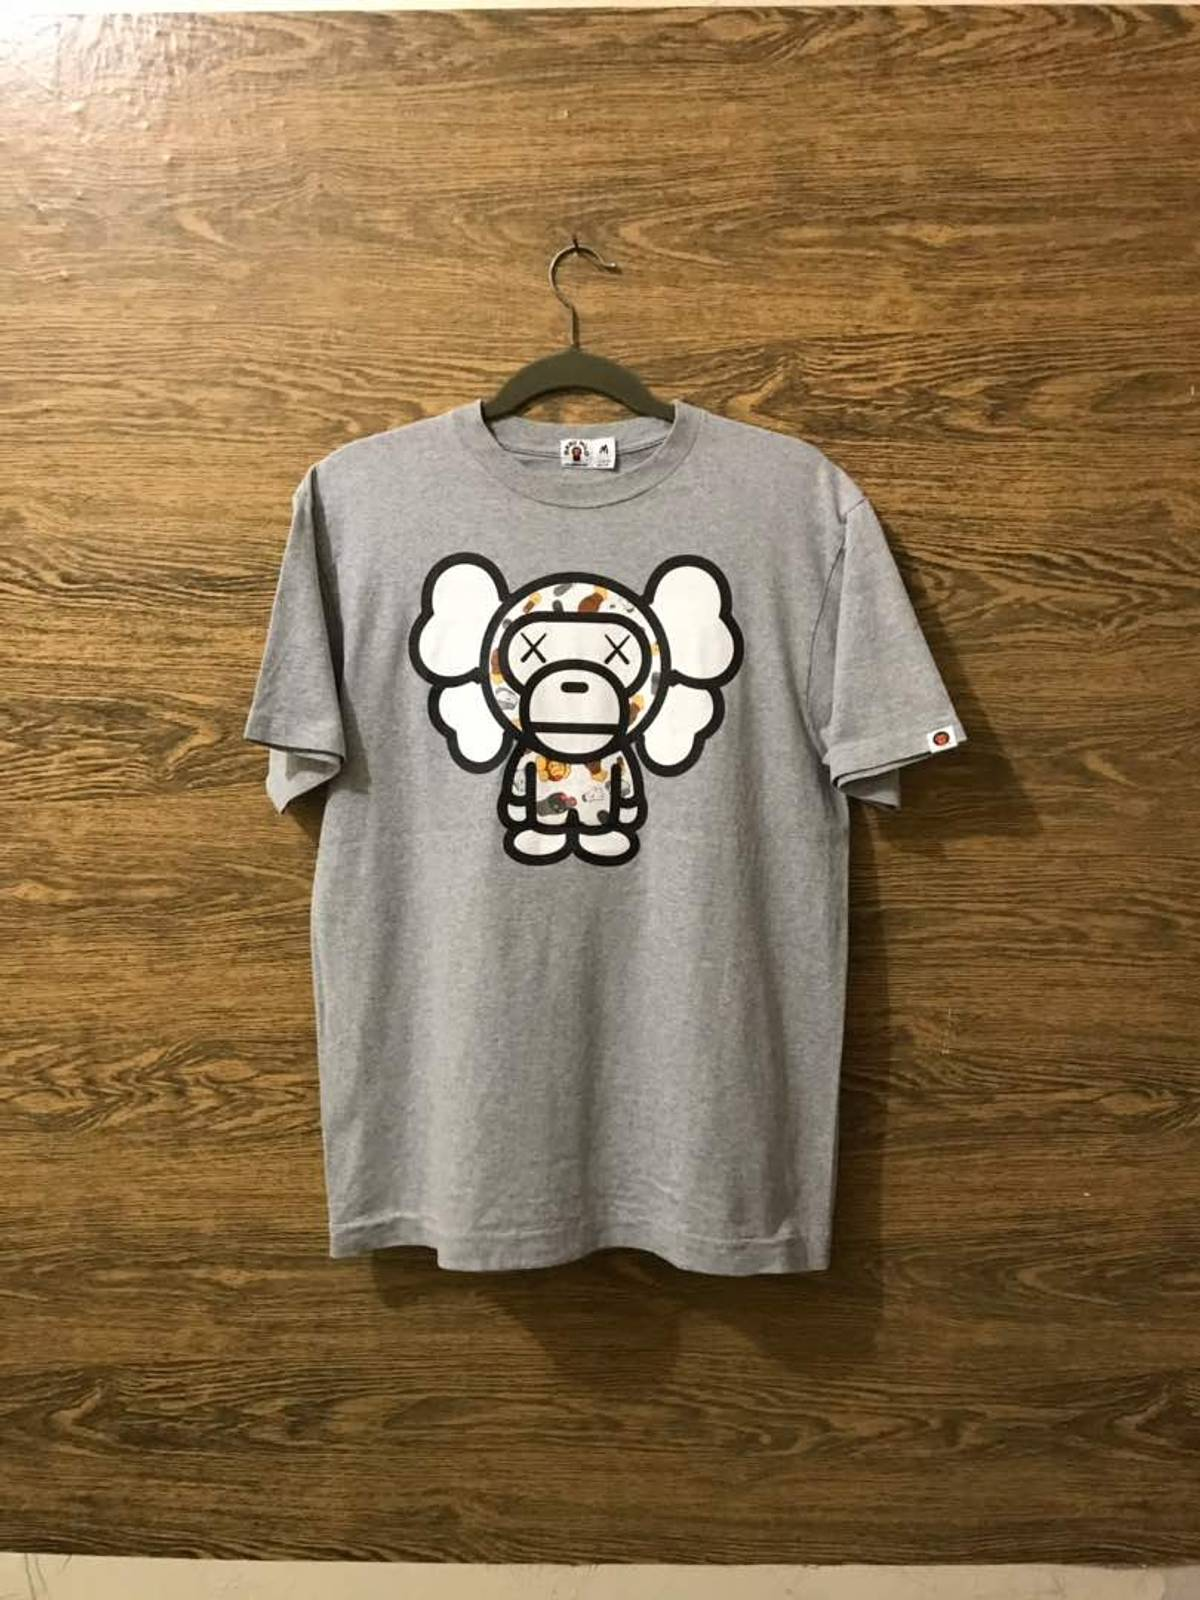 e861673f9 Bape Sale... Rere Baby Milo By Bape Tshirt/big Print Logo/ Rere ...